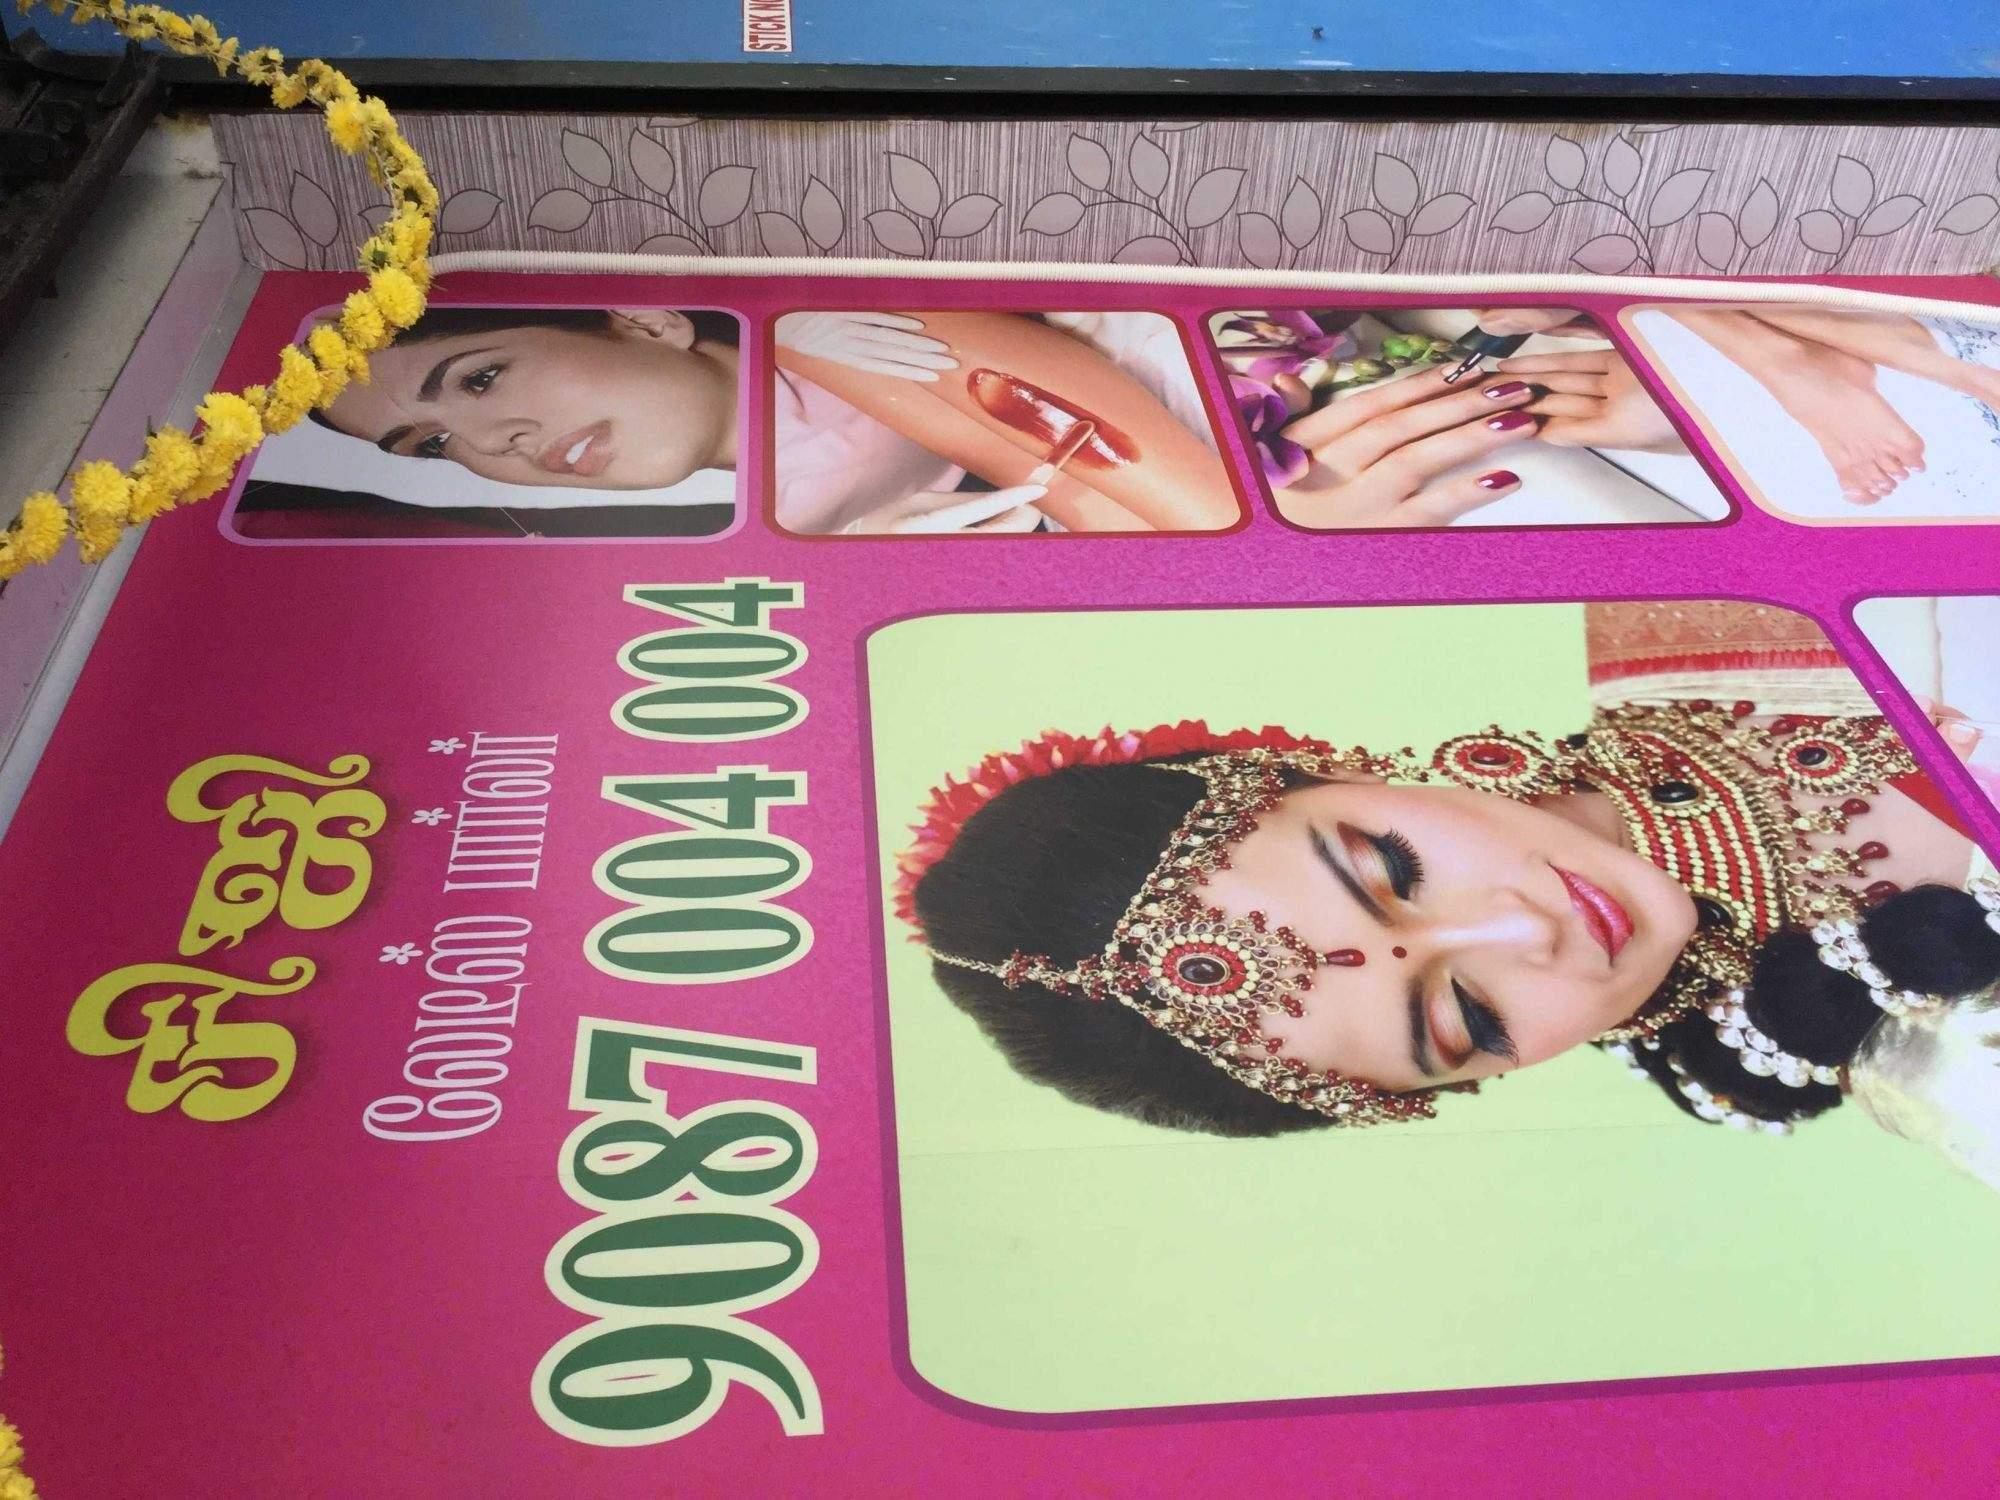 Top 9 Nail Spas in Porur, Chennai - Nail Salons in Chennai - Justdial